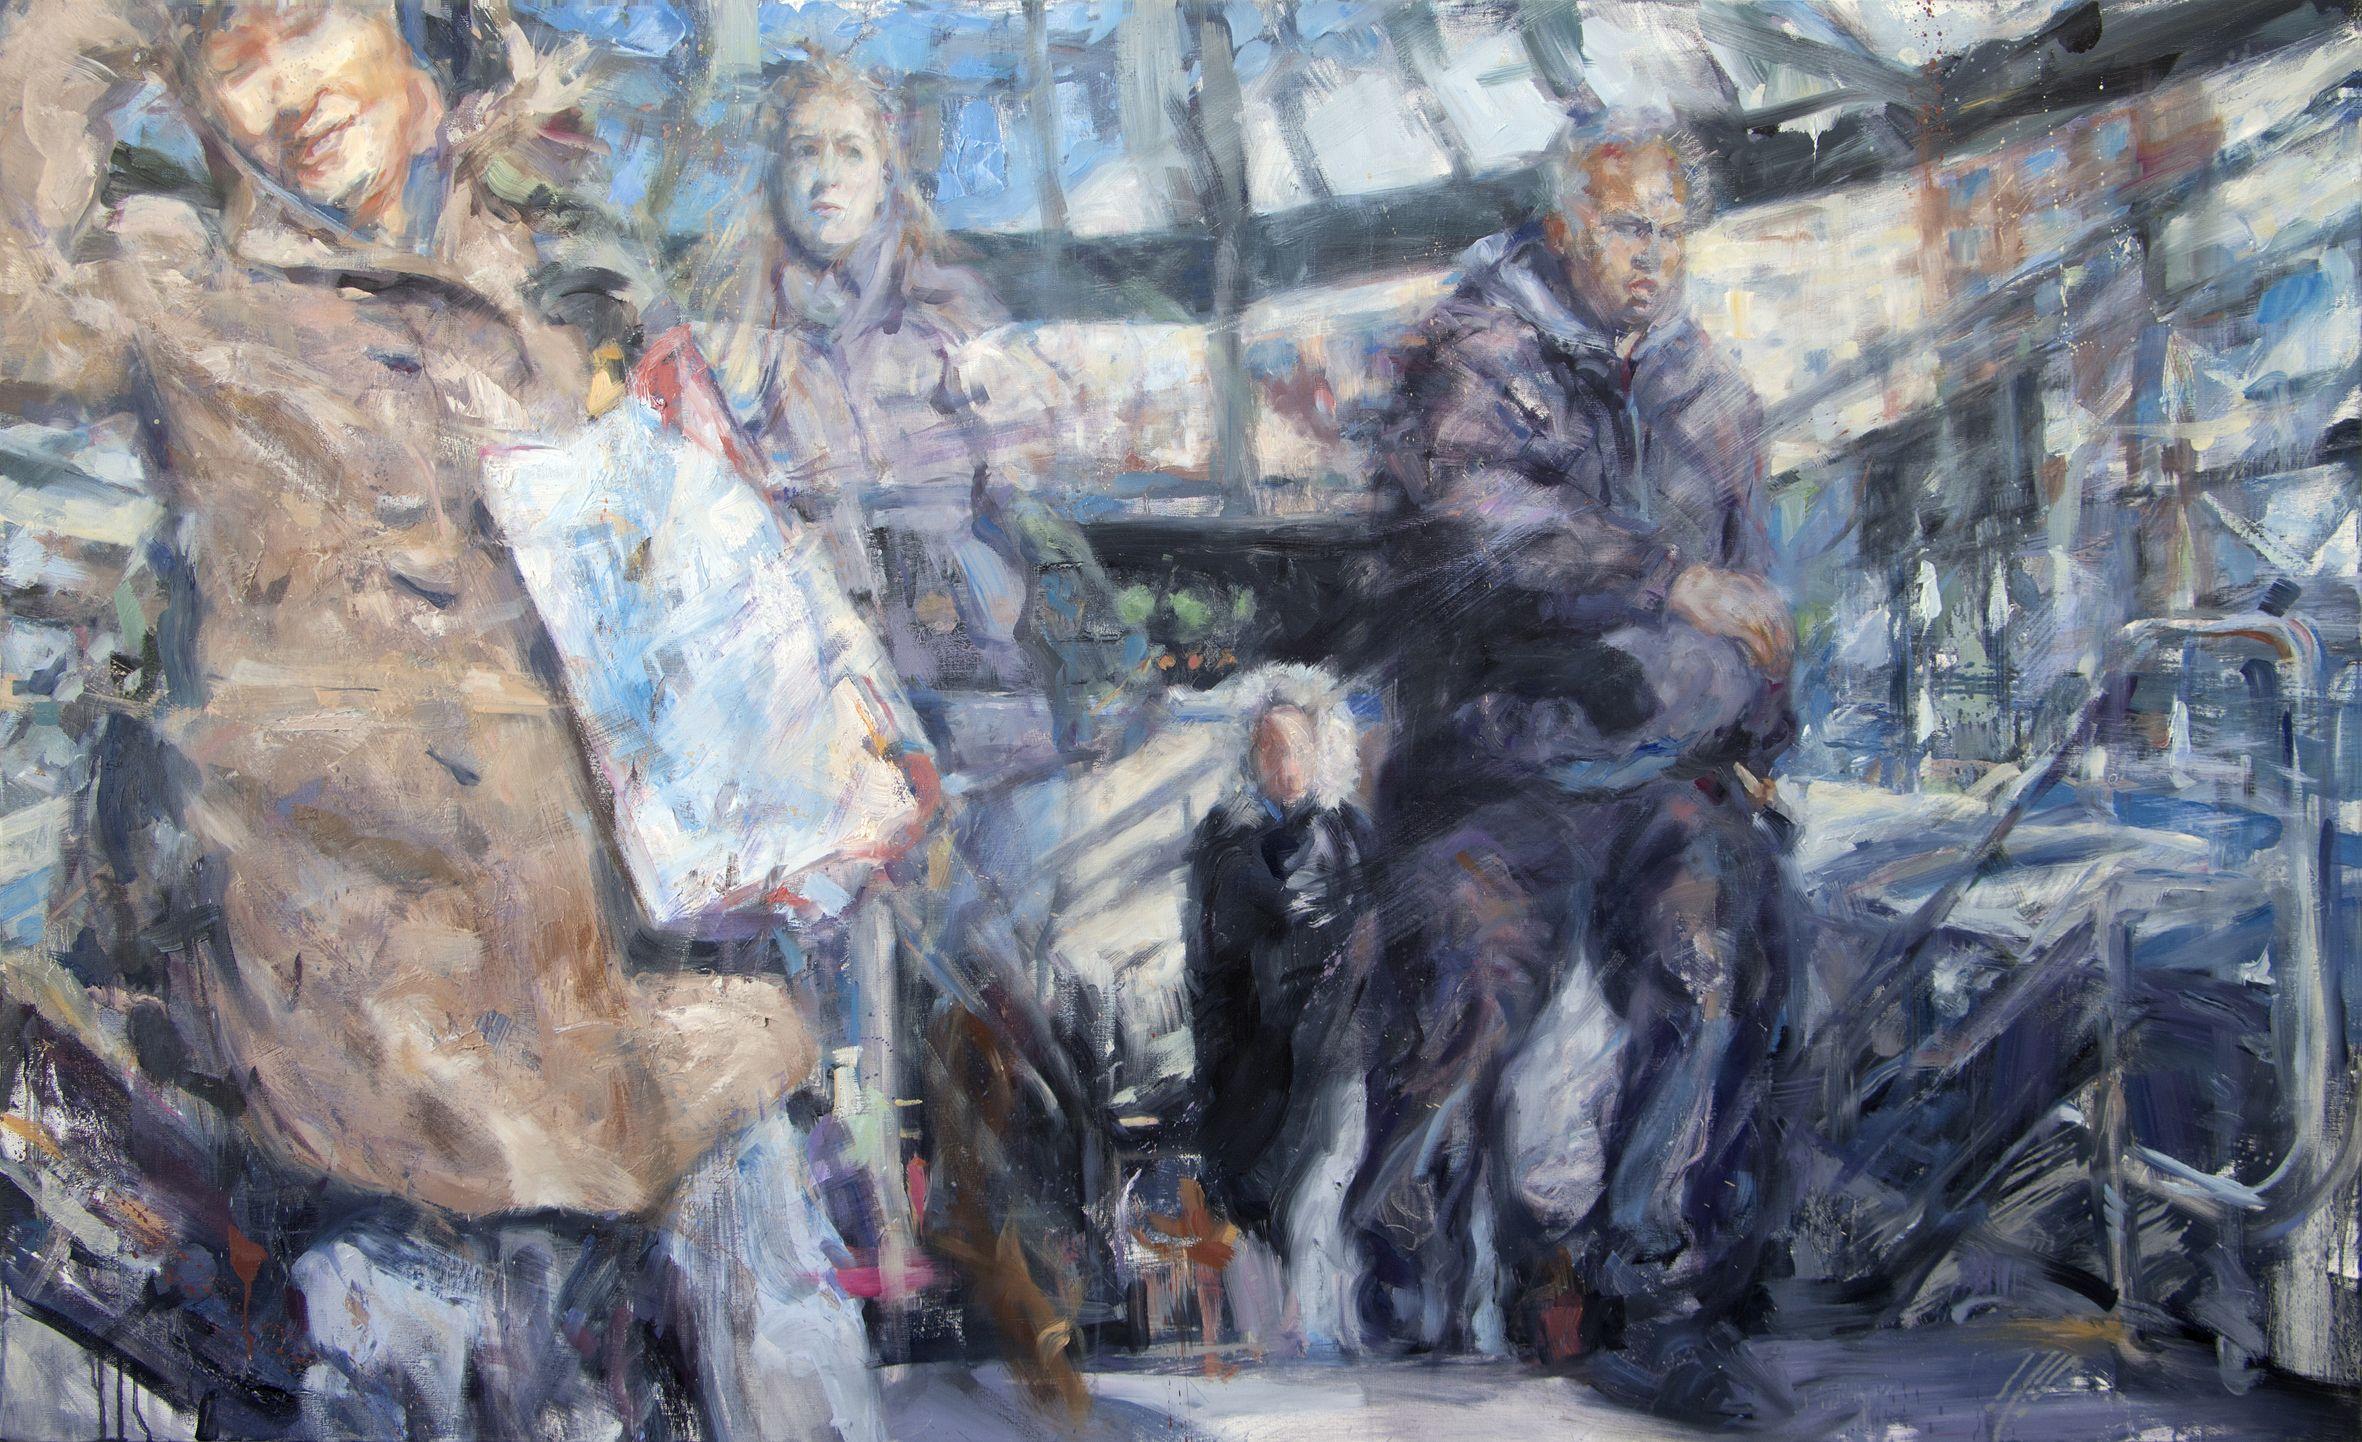 Ian Factor, Emergence, 2014, oil on canvas, cm 91.5x152_courtesy Accesso Galleria